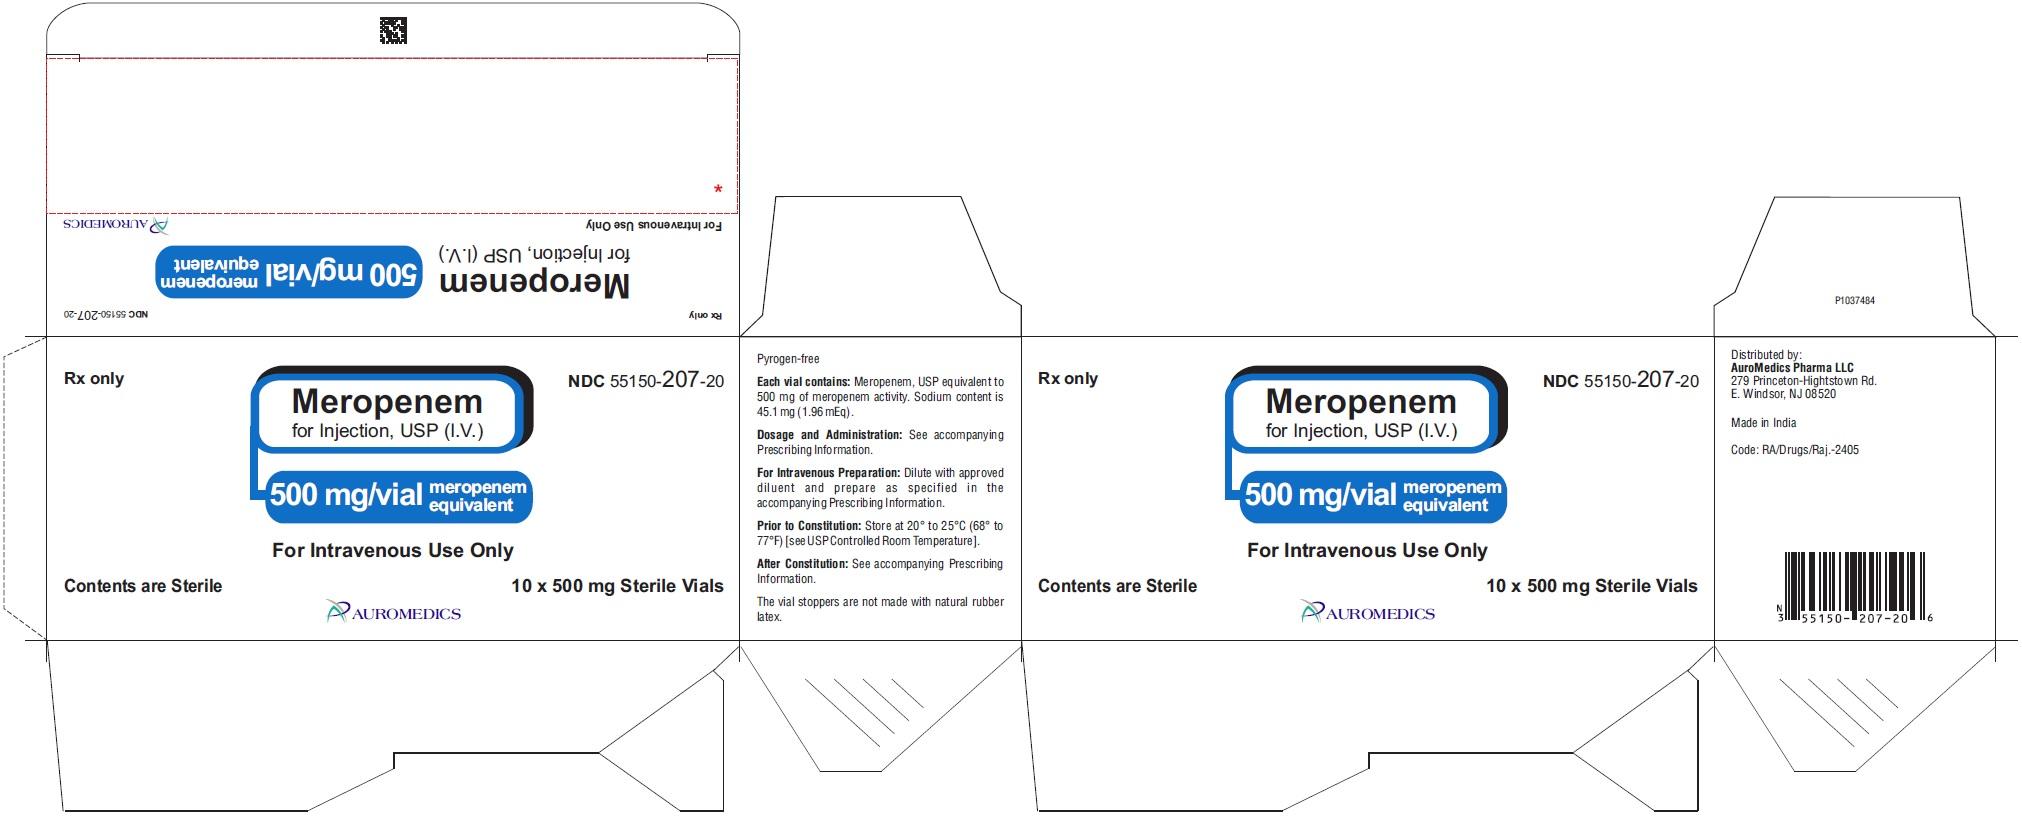 PACKAGE LABEL-PRINCIPAL DISPLAY PANEL - 500 mg/vial - Container-Carton (10 Vials)